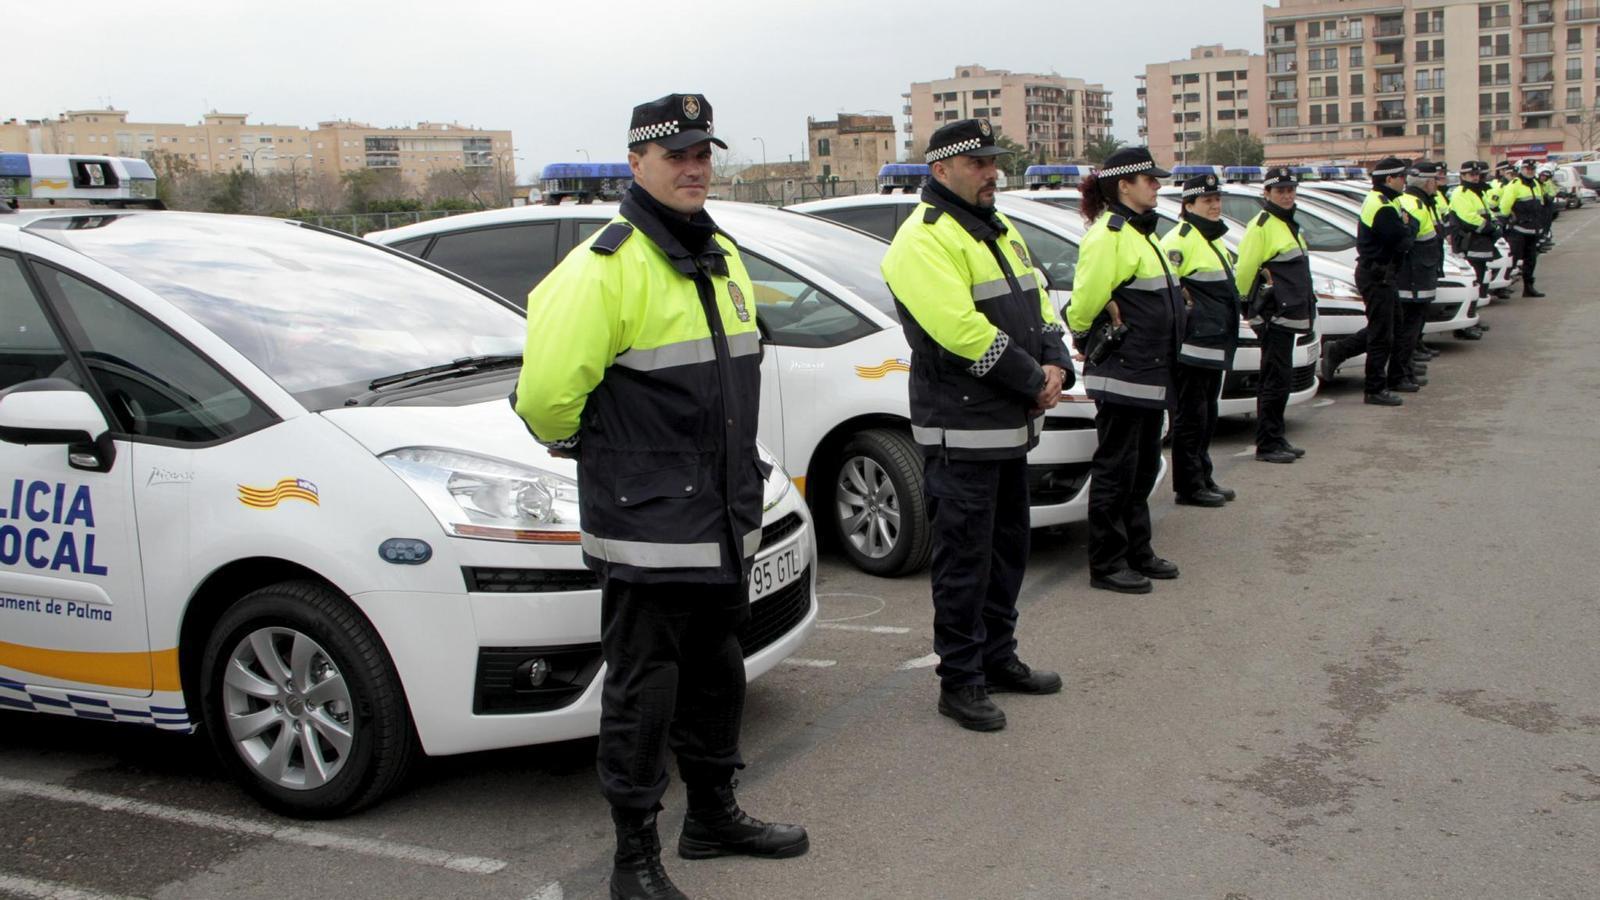 Prop de 500 persones presenten a les oposicions de Policia Local.